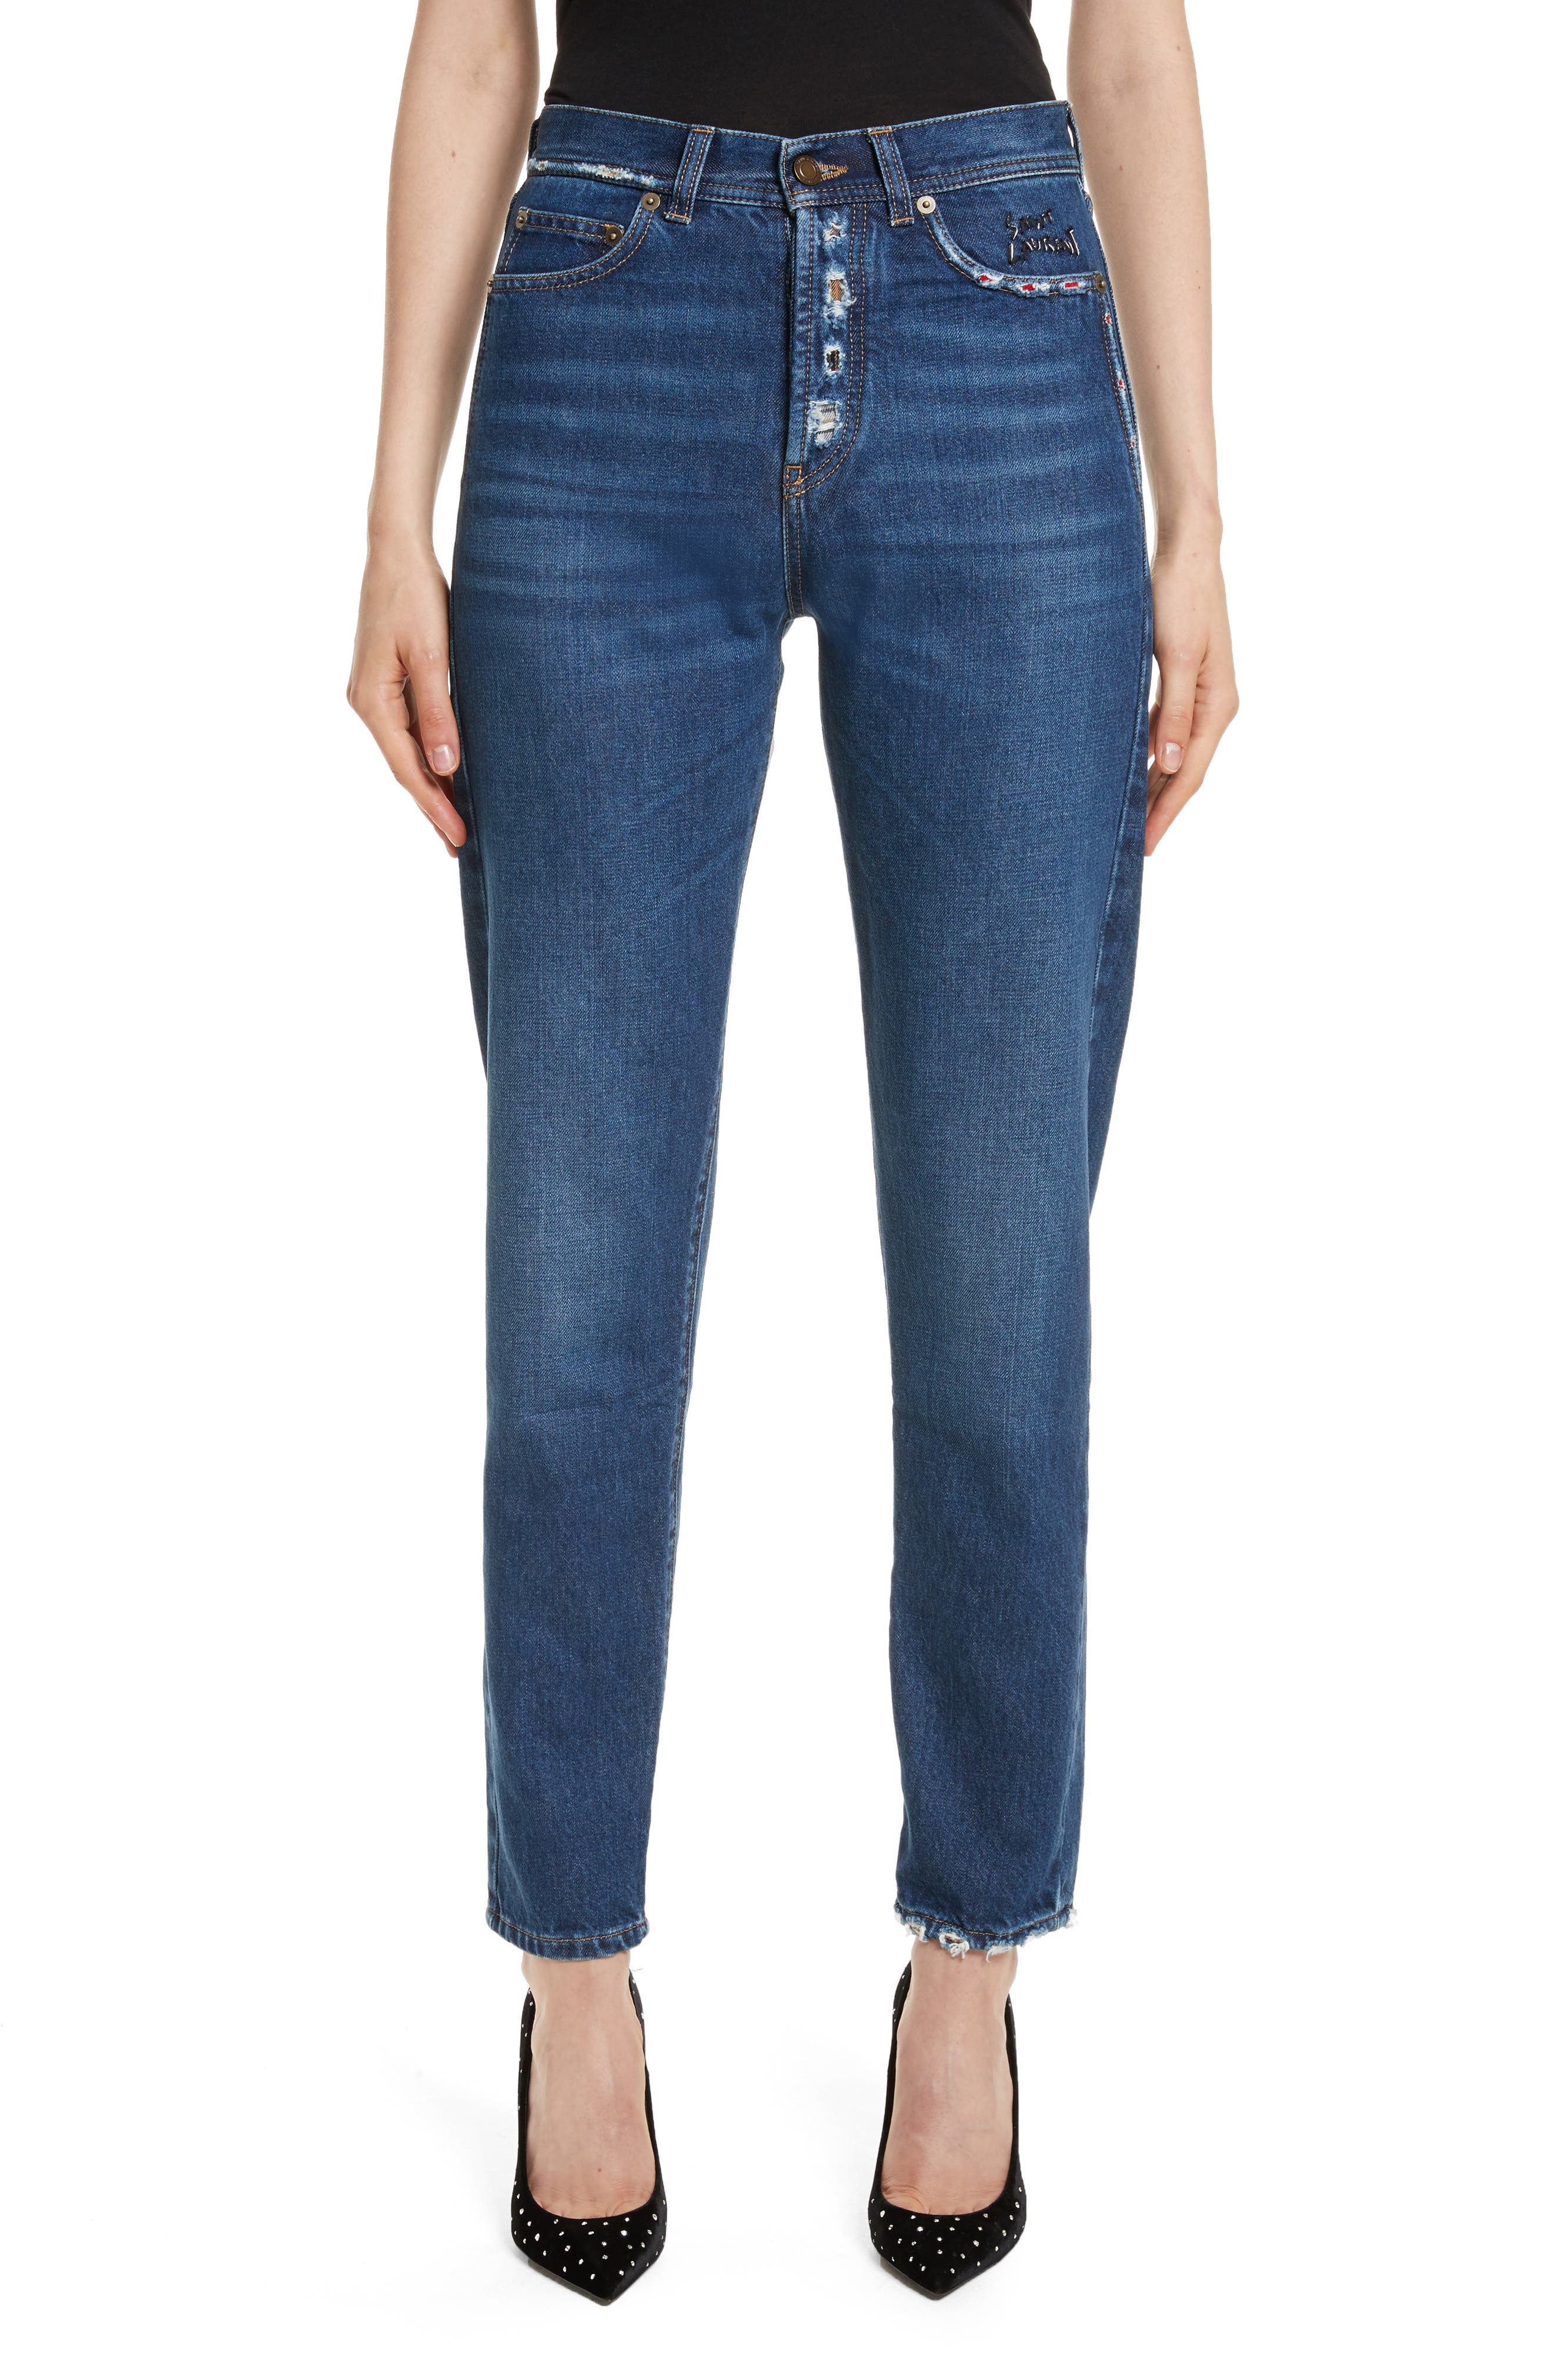 Main Image - Saint Laurent Embroidered Jeans (Deep Dark Blue)